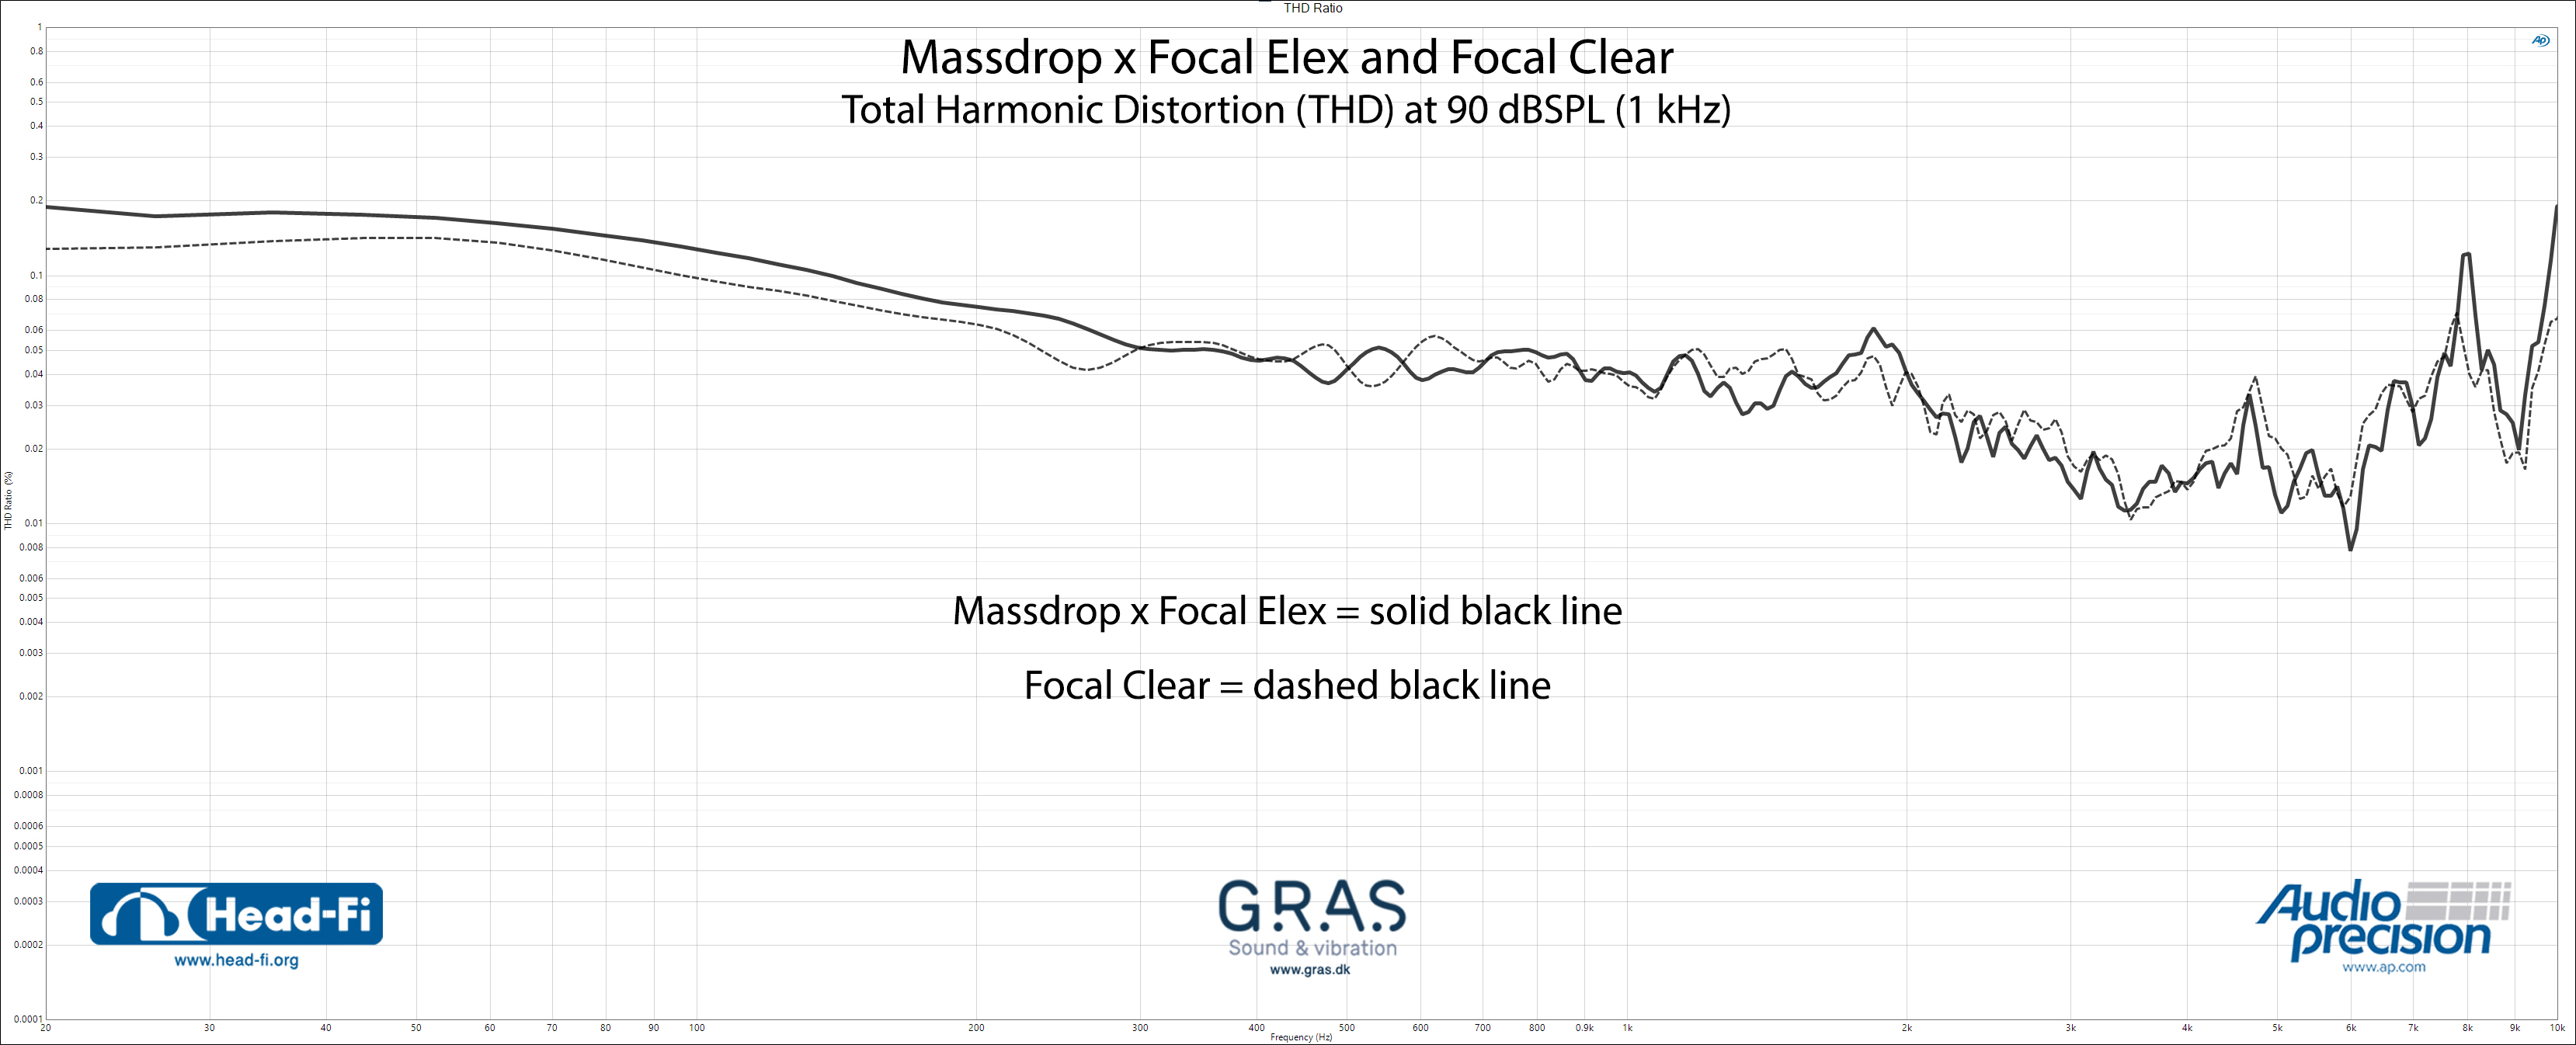 THD-Ratio_Massdrop-x-Focal-Elex_Focal-Clear.jpg